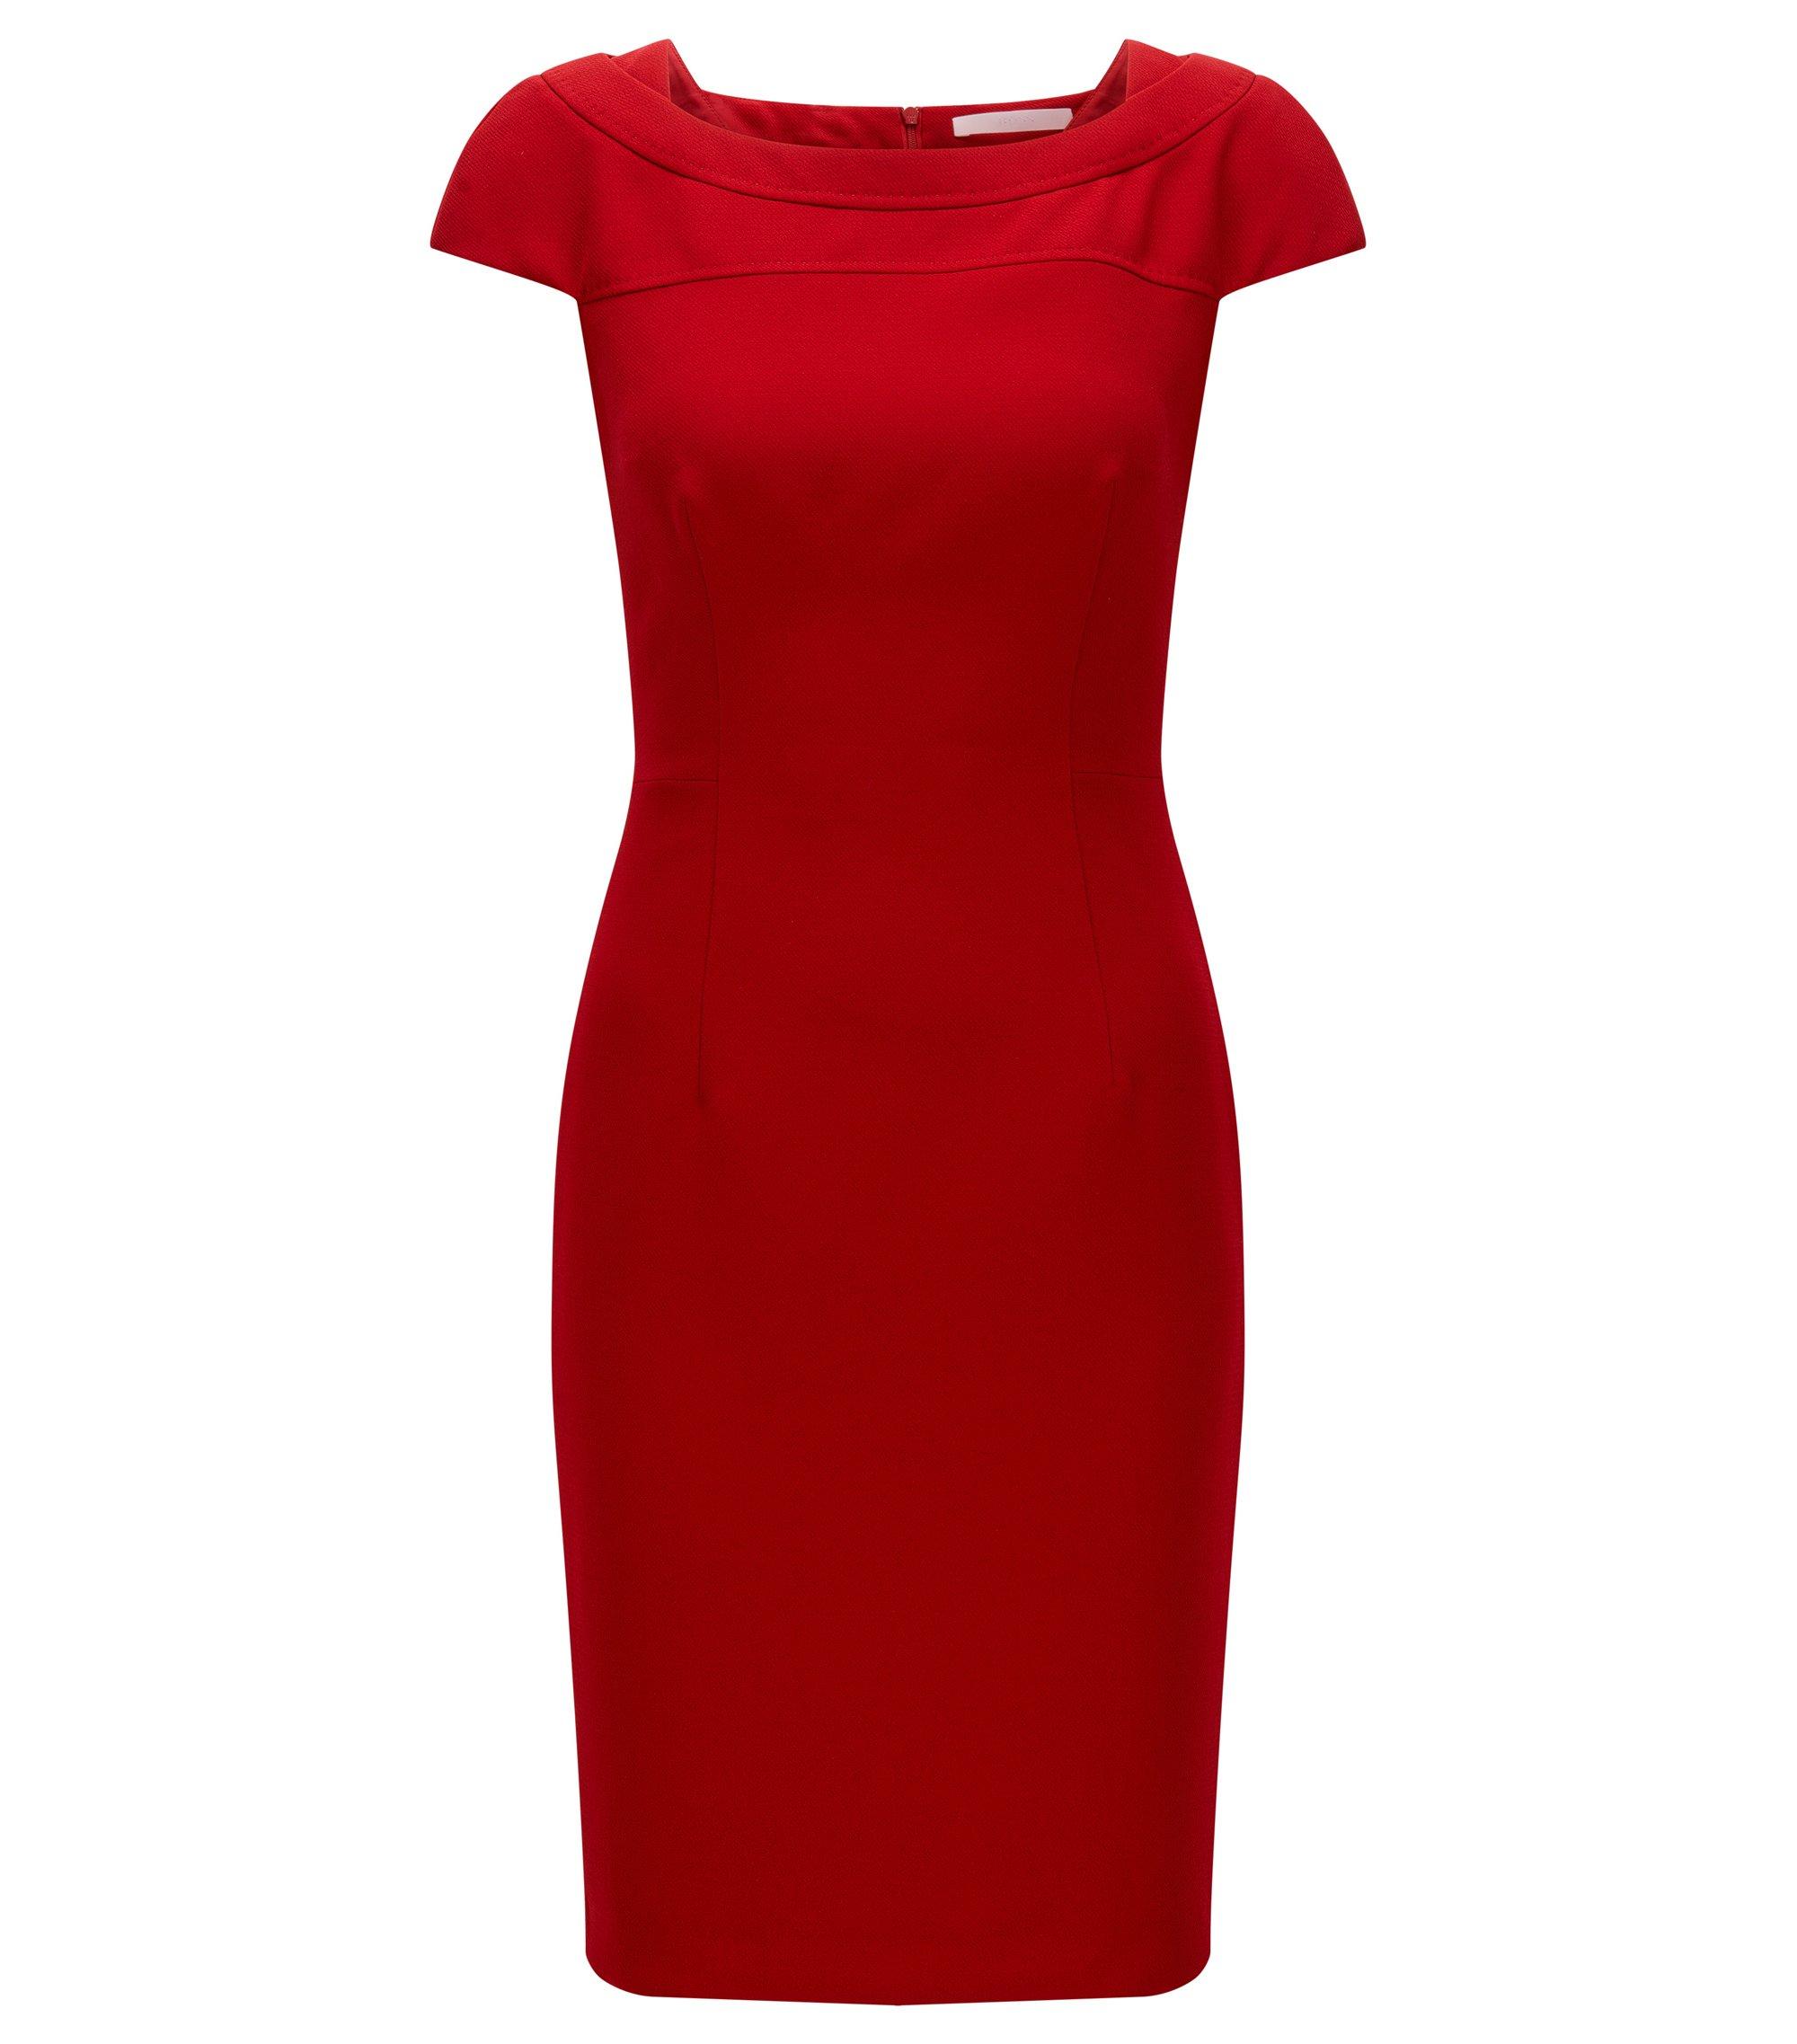 Slim-Fit Kleid aus strukturiertem Krepp, Rot